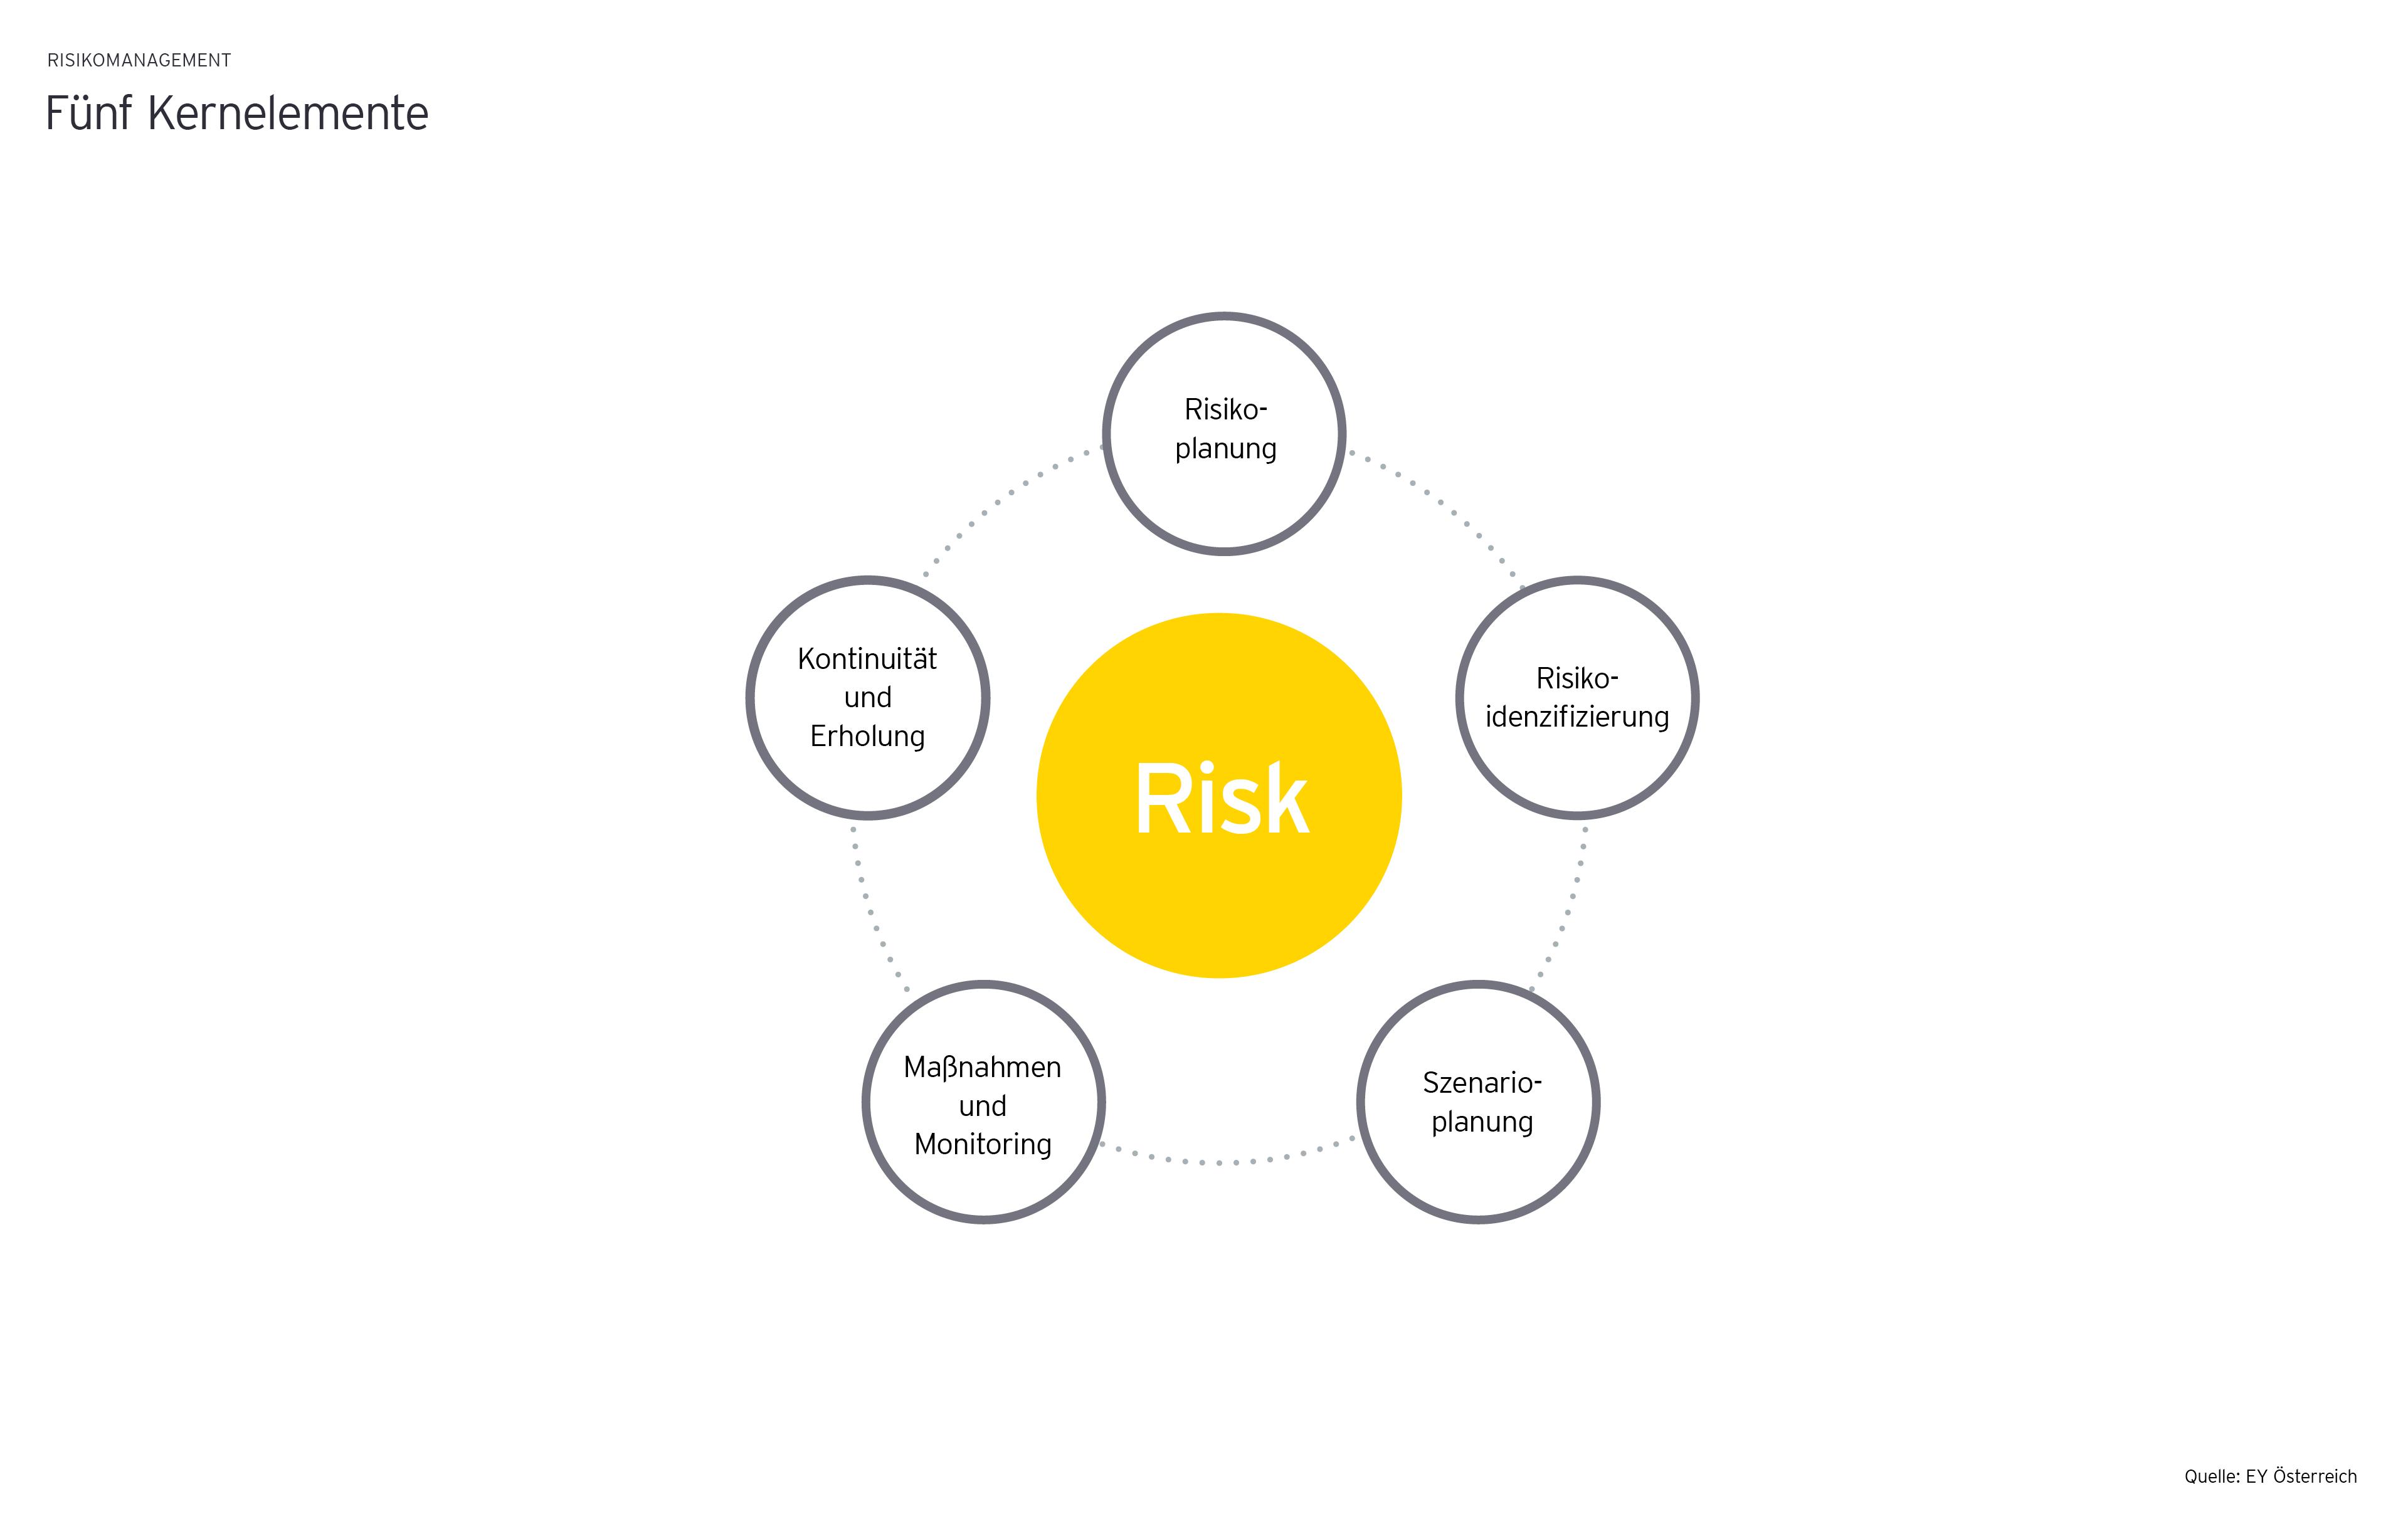 Risikomanagement